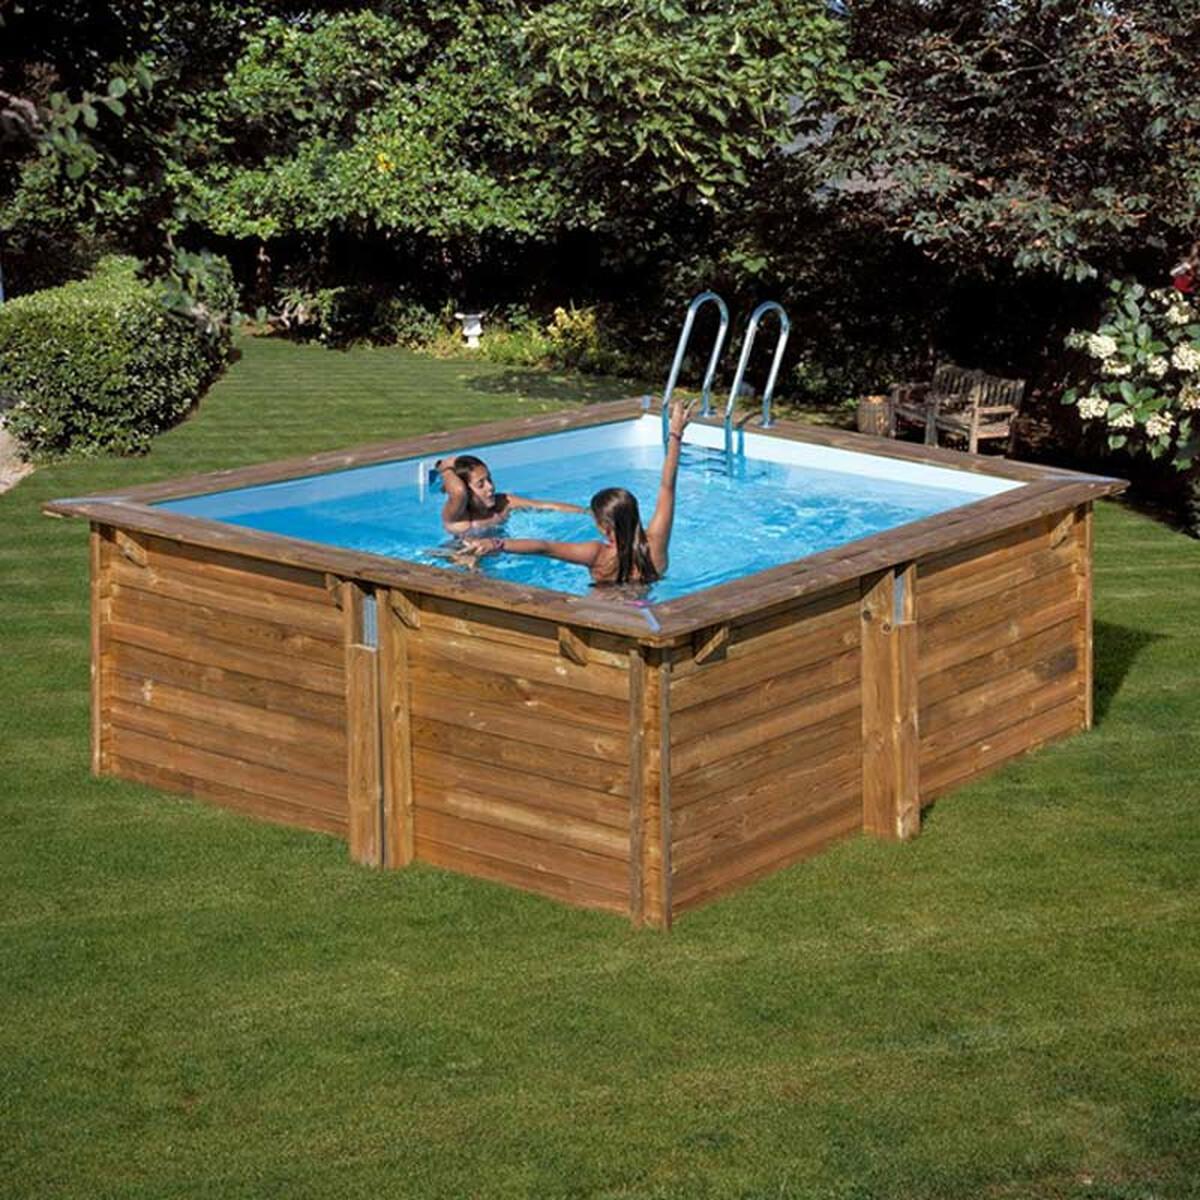 Full Size of Mini Pool Kaufen Gre Holzbecken Echtholz Rechteckpool Carra 305x305x119cm Regal Big Sofa Günstig Fenster Im Garten Bauen Schüco Duschen Guenstig Bett Wohnzimmer Mini Pool Kaufen